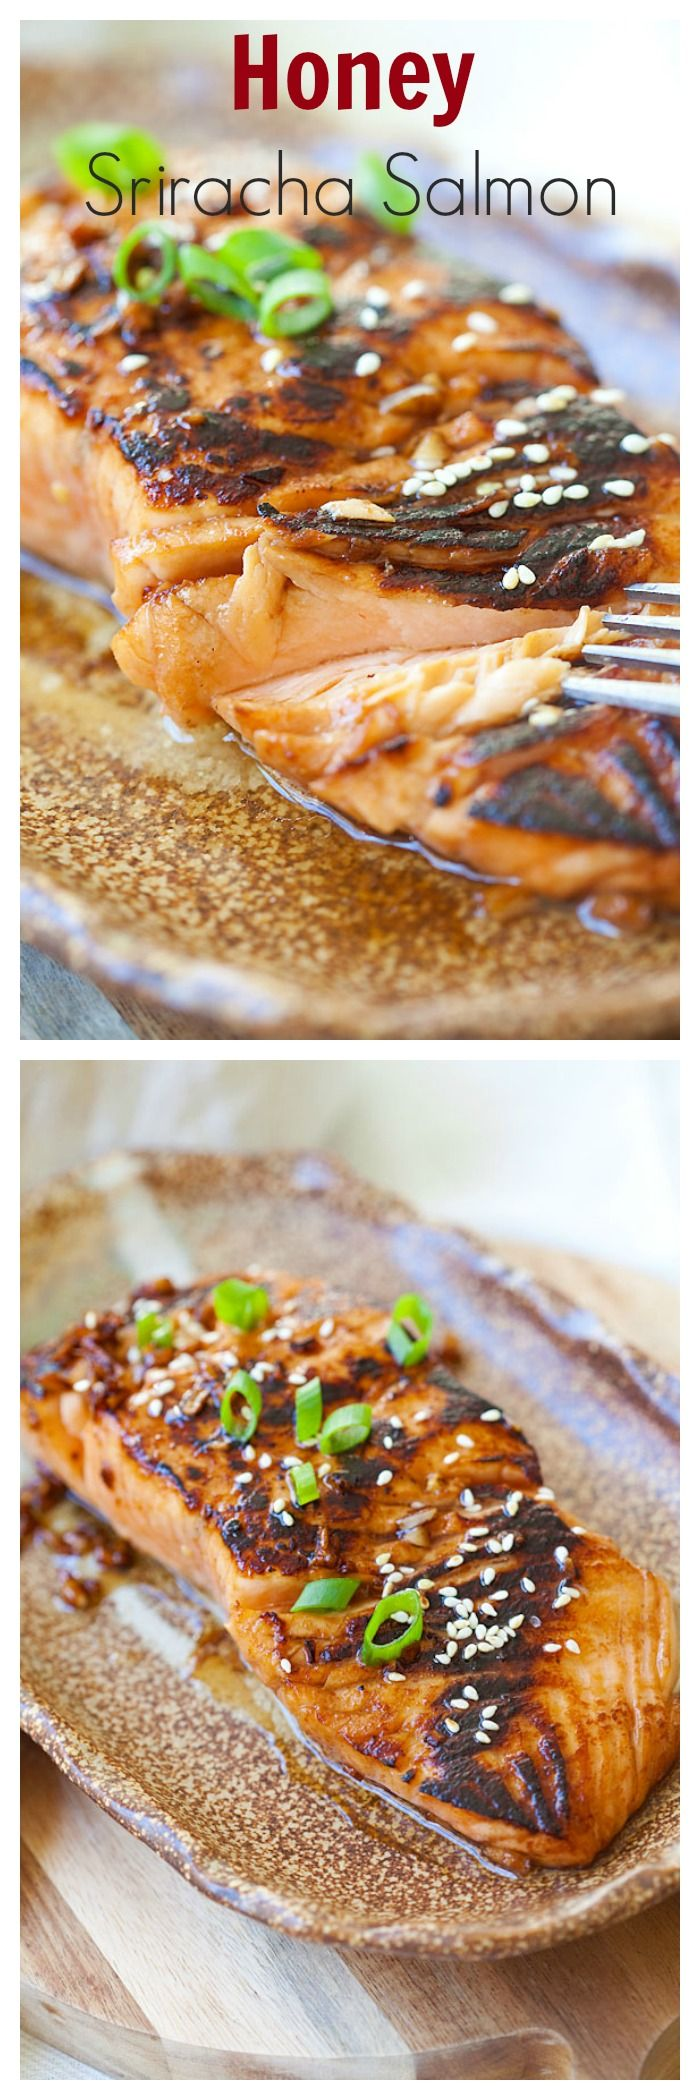 Sweet & Spicy Sriracha-glazed Salmon in the @skinnytaste cookbook. Moist, juicy, and so yummy | rasamalaysia.com